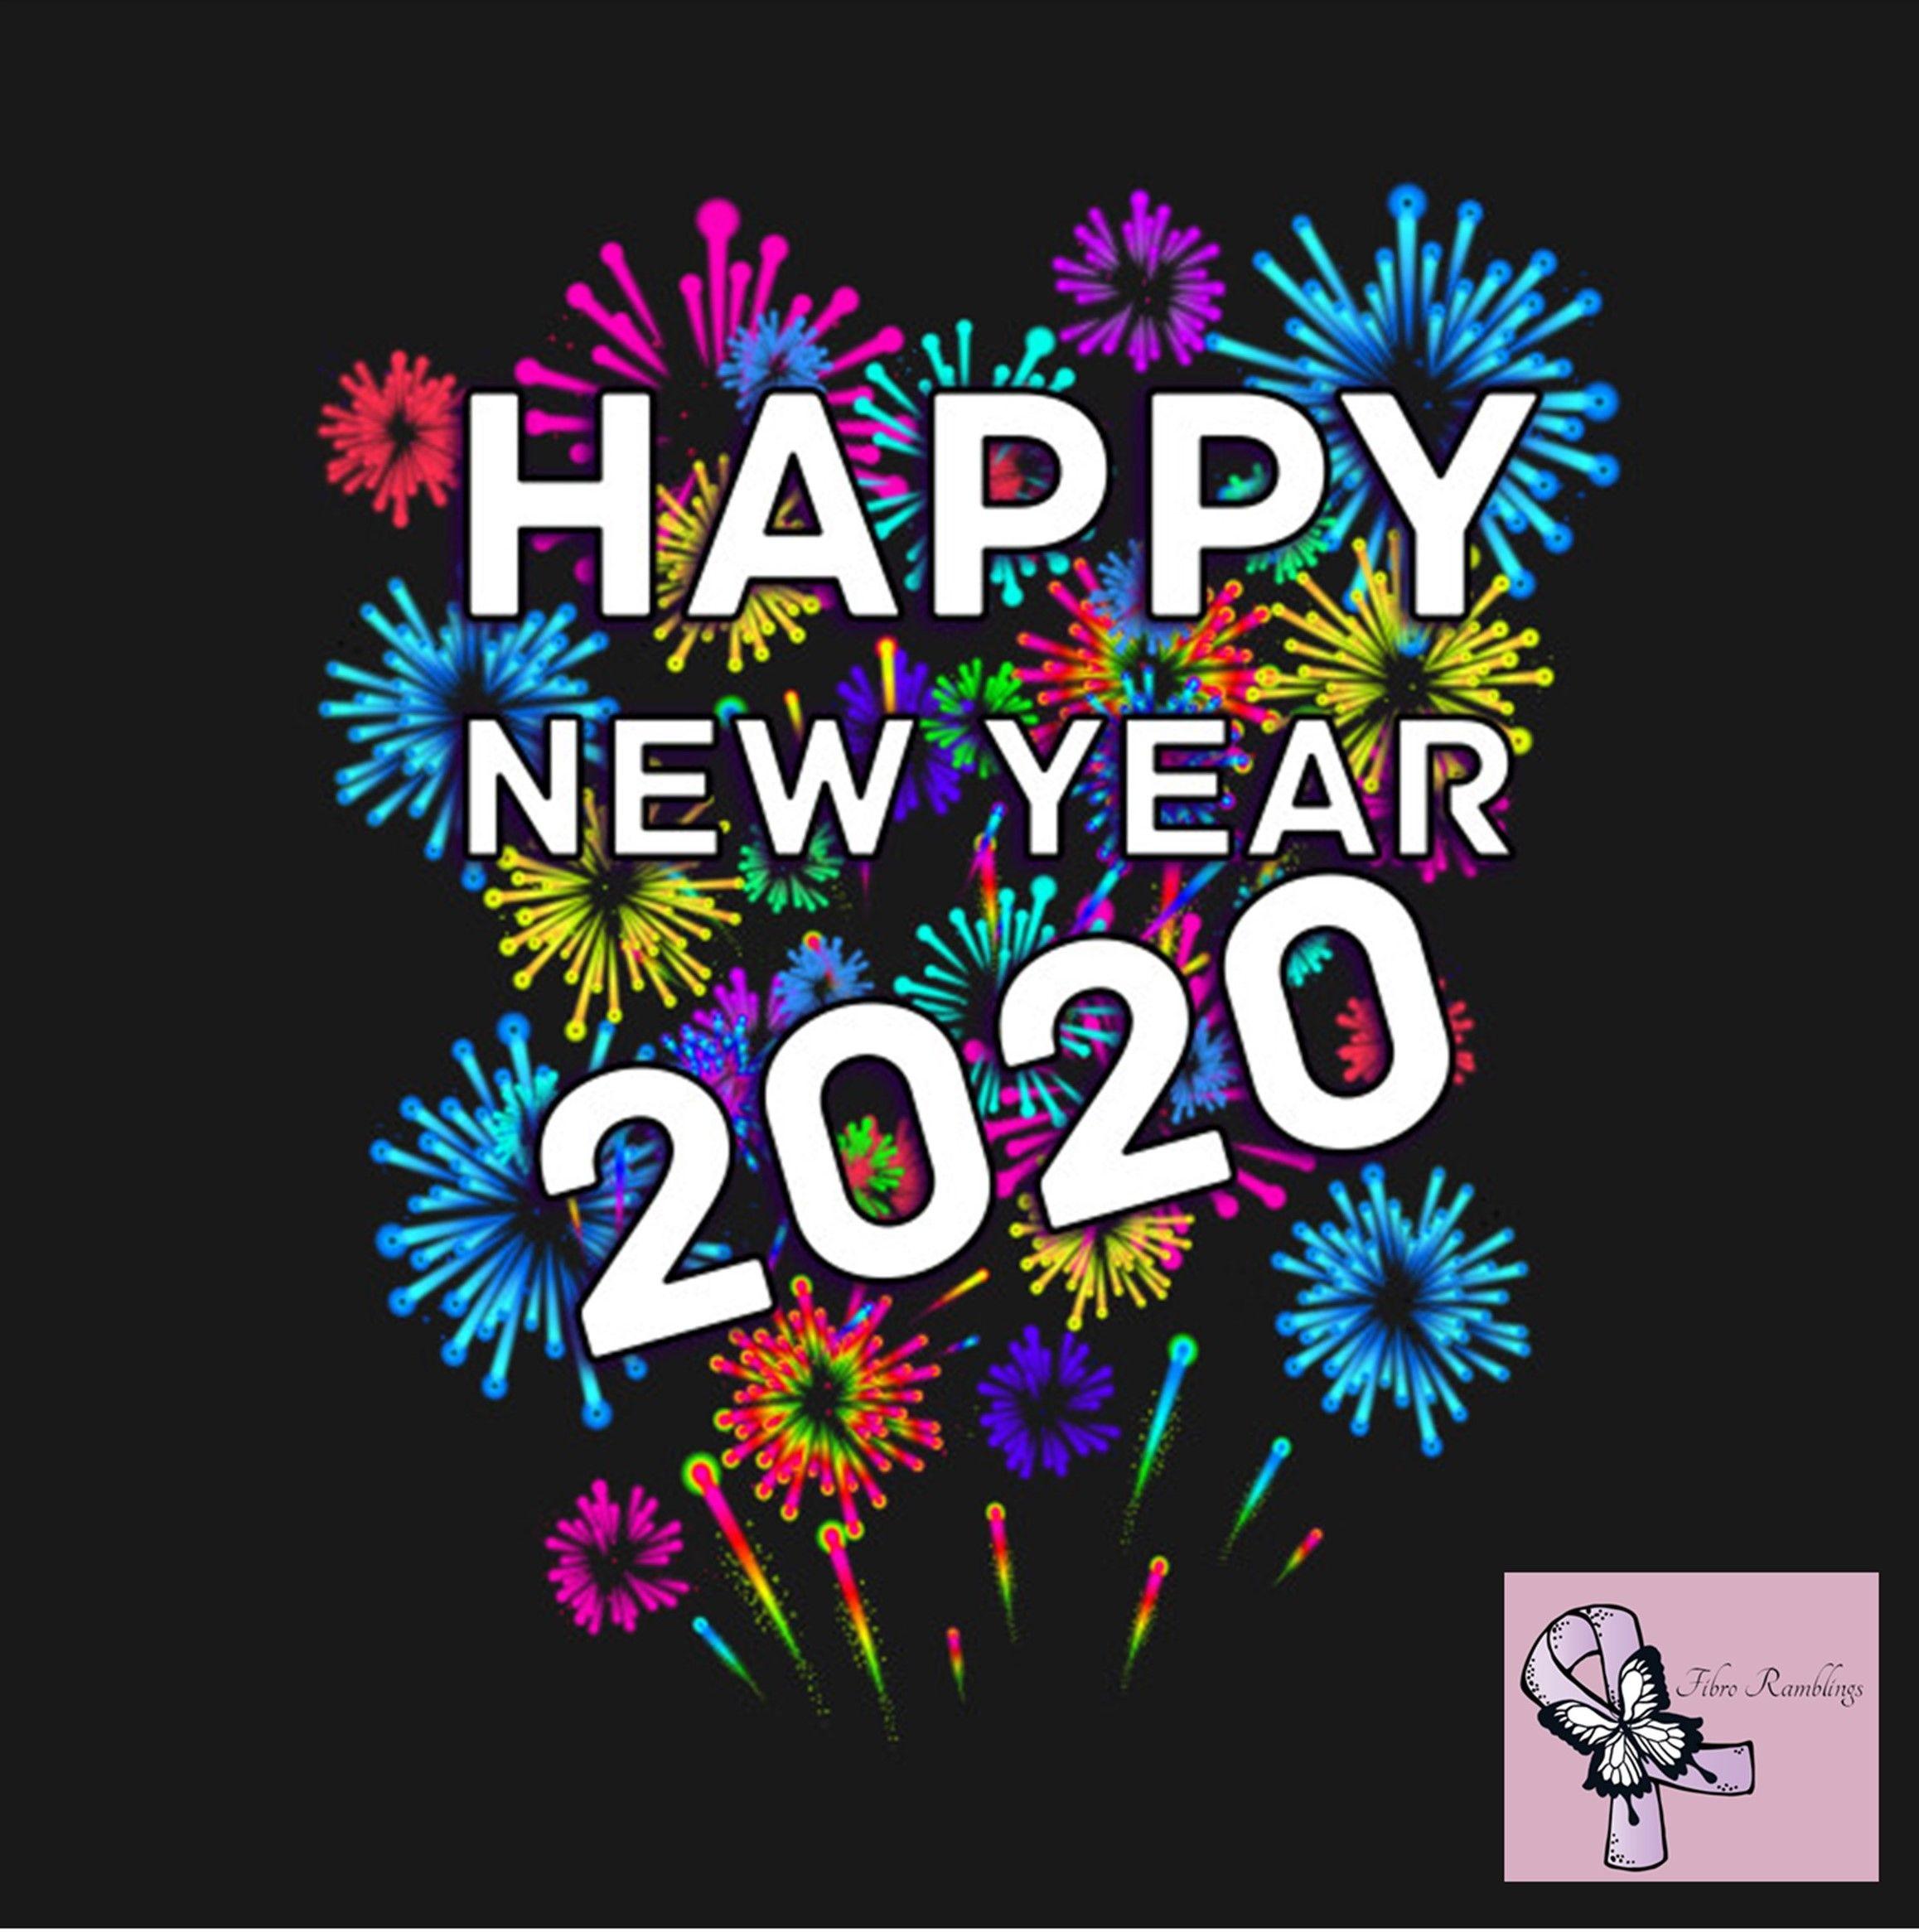 Happy New Year 2020 Happy New Year Greetings Happy New Year Wishes Happy New Year Images